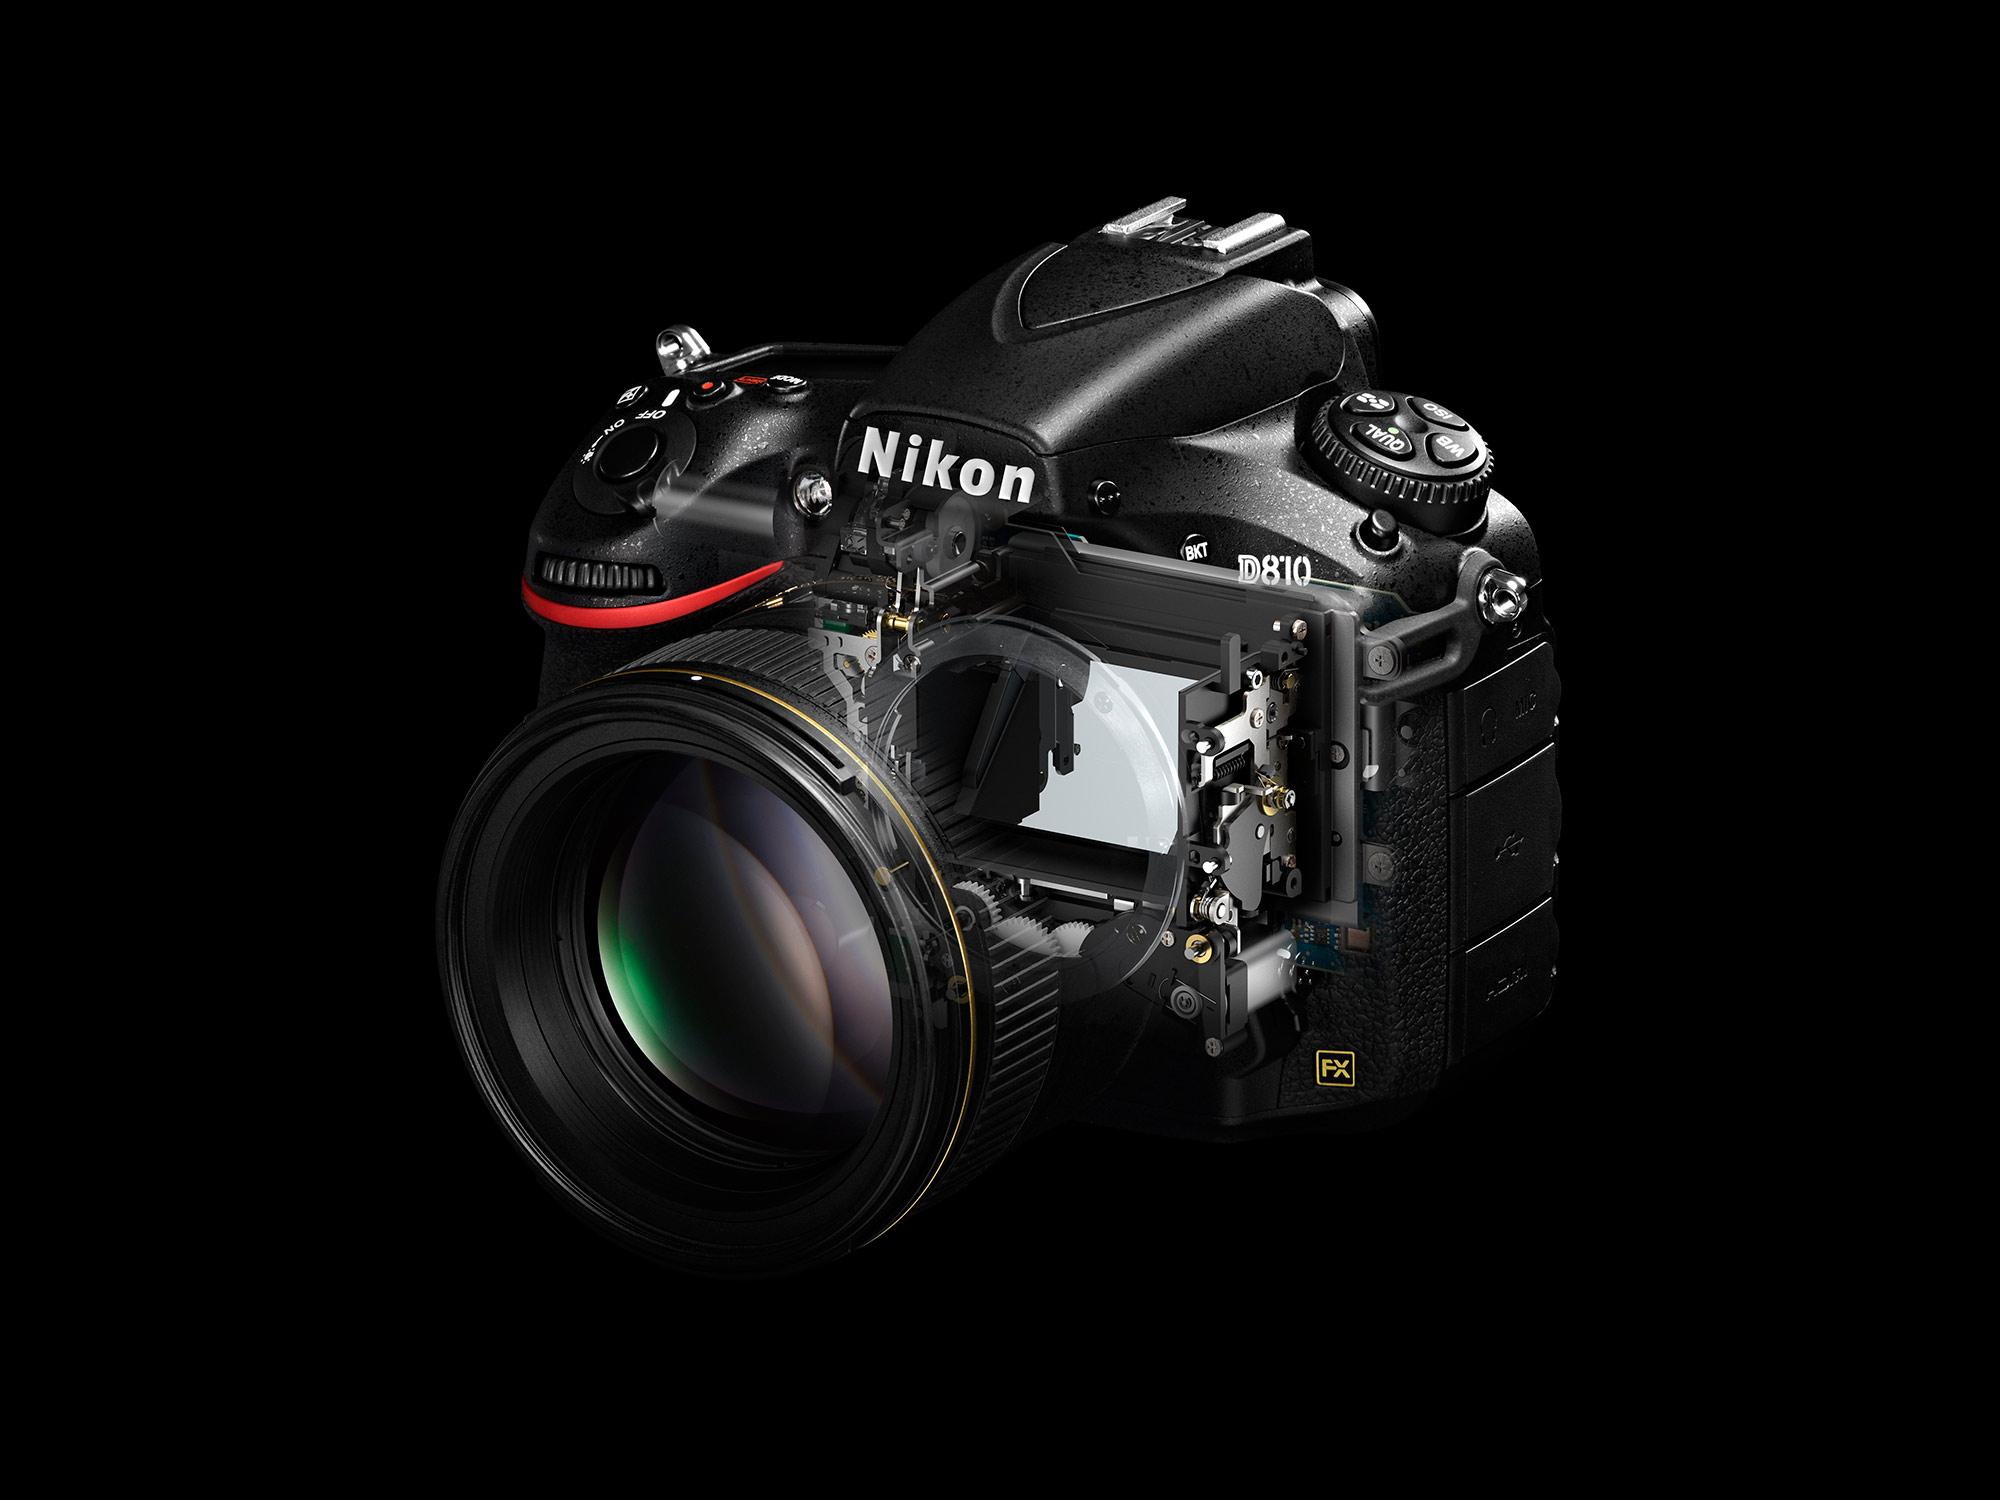 Nikon D810 doorsnede